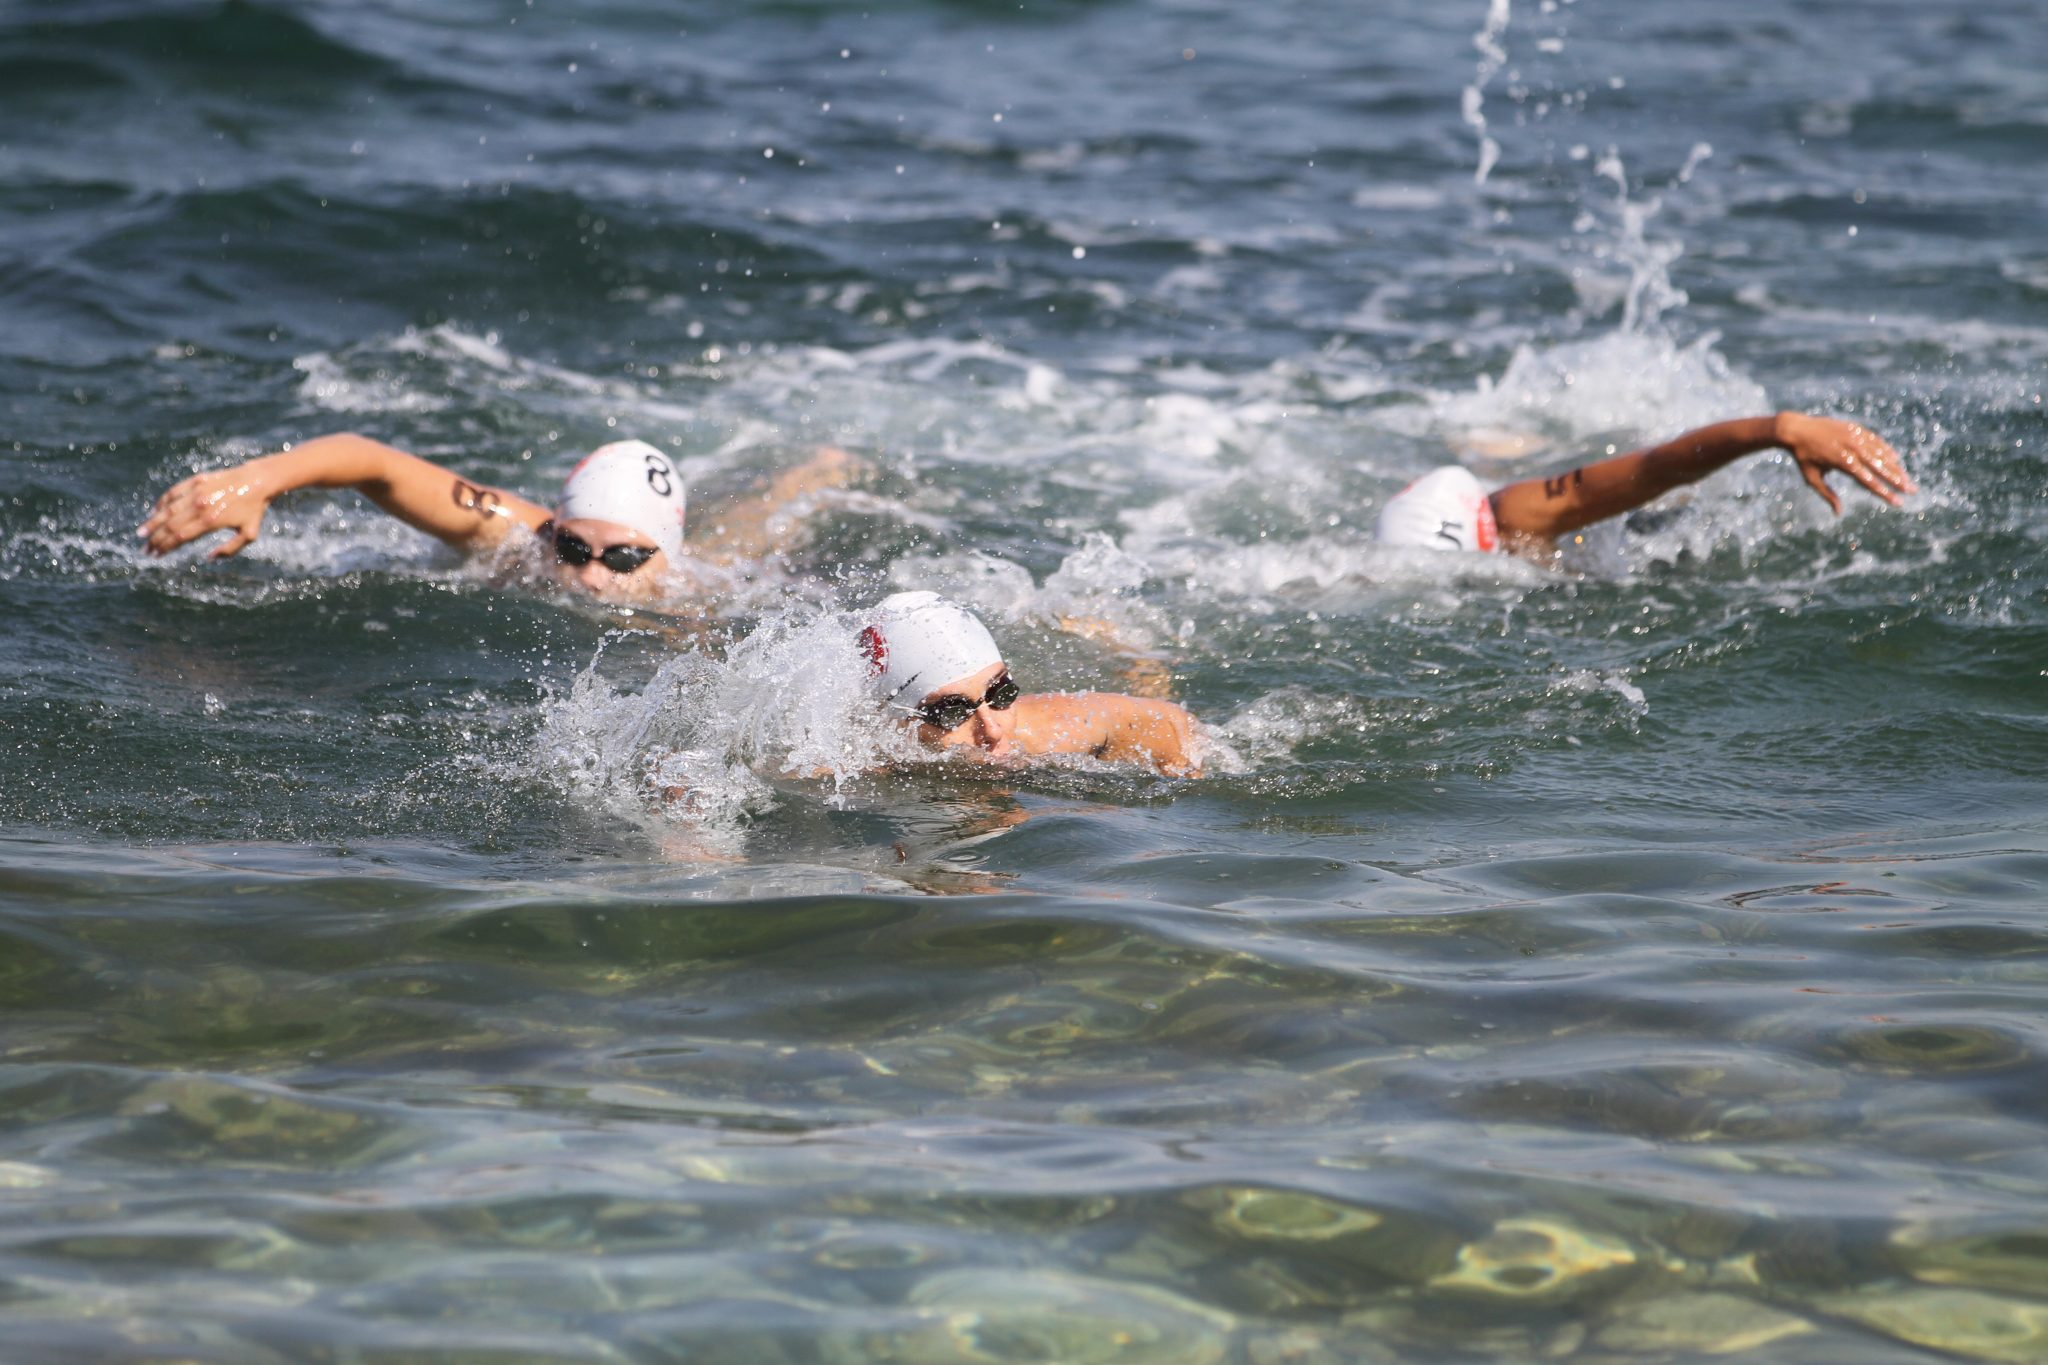 ISTANBUL TURKEY - JULY 30 2017: Athletes competing in swimming component of Istanbul Beylikduzu ETU Triathlon European Cup.